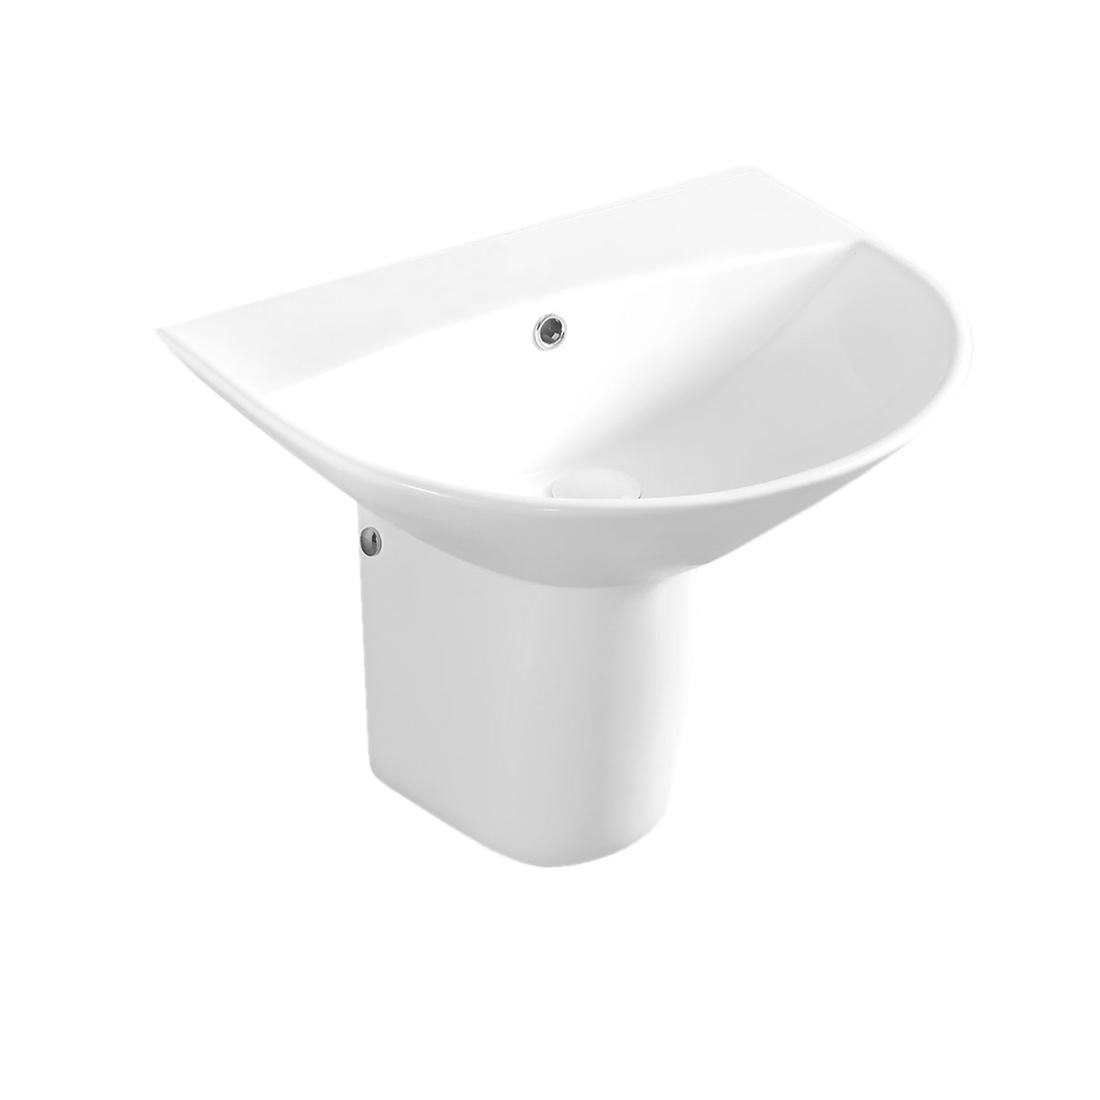 Kerovit Torso KB5300E Wash Basin With Half-Pedestal